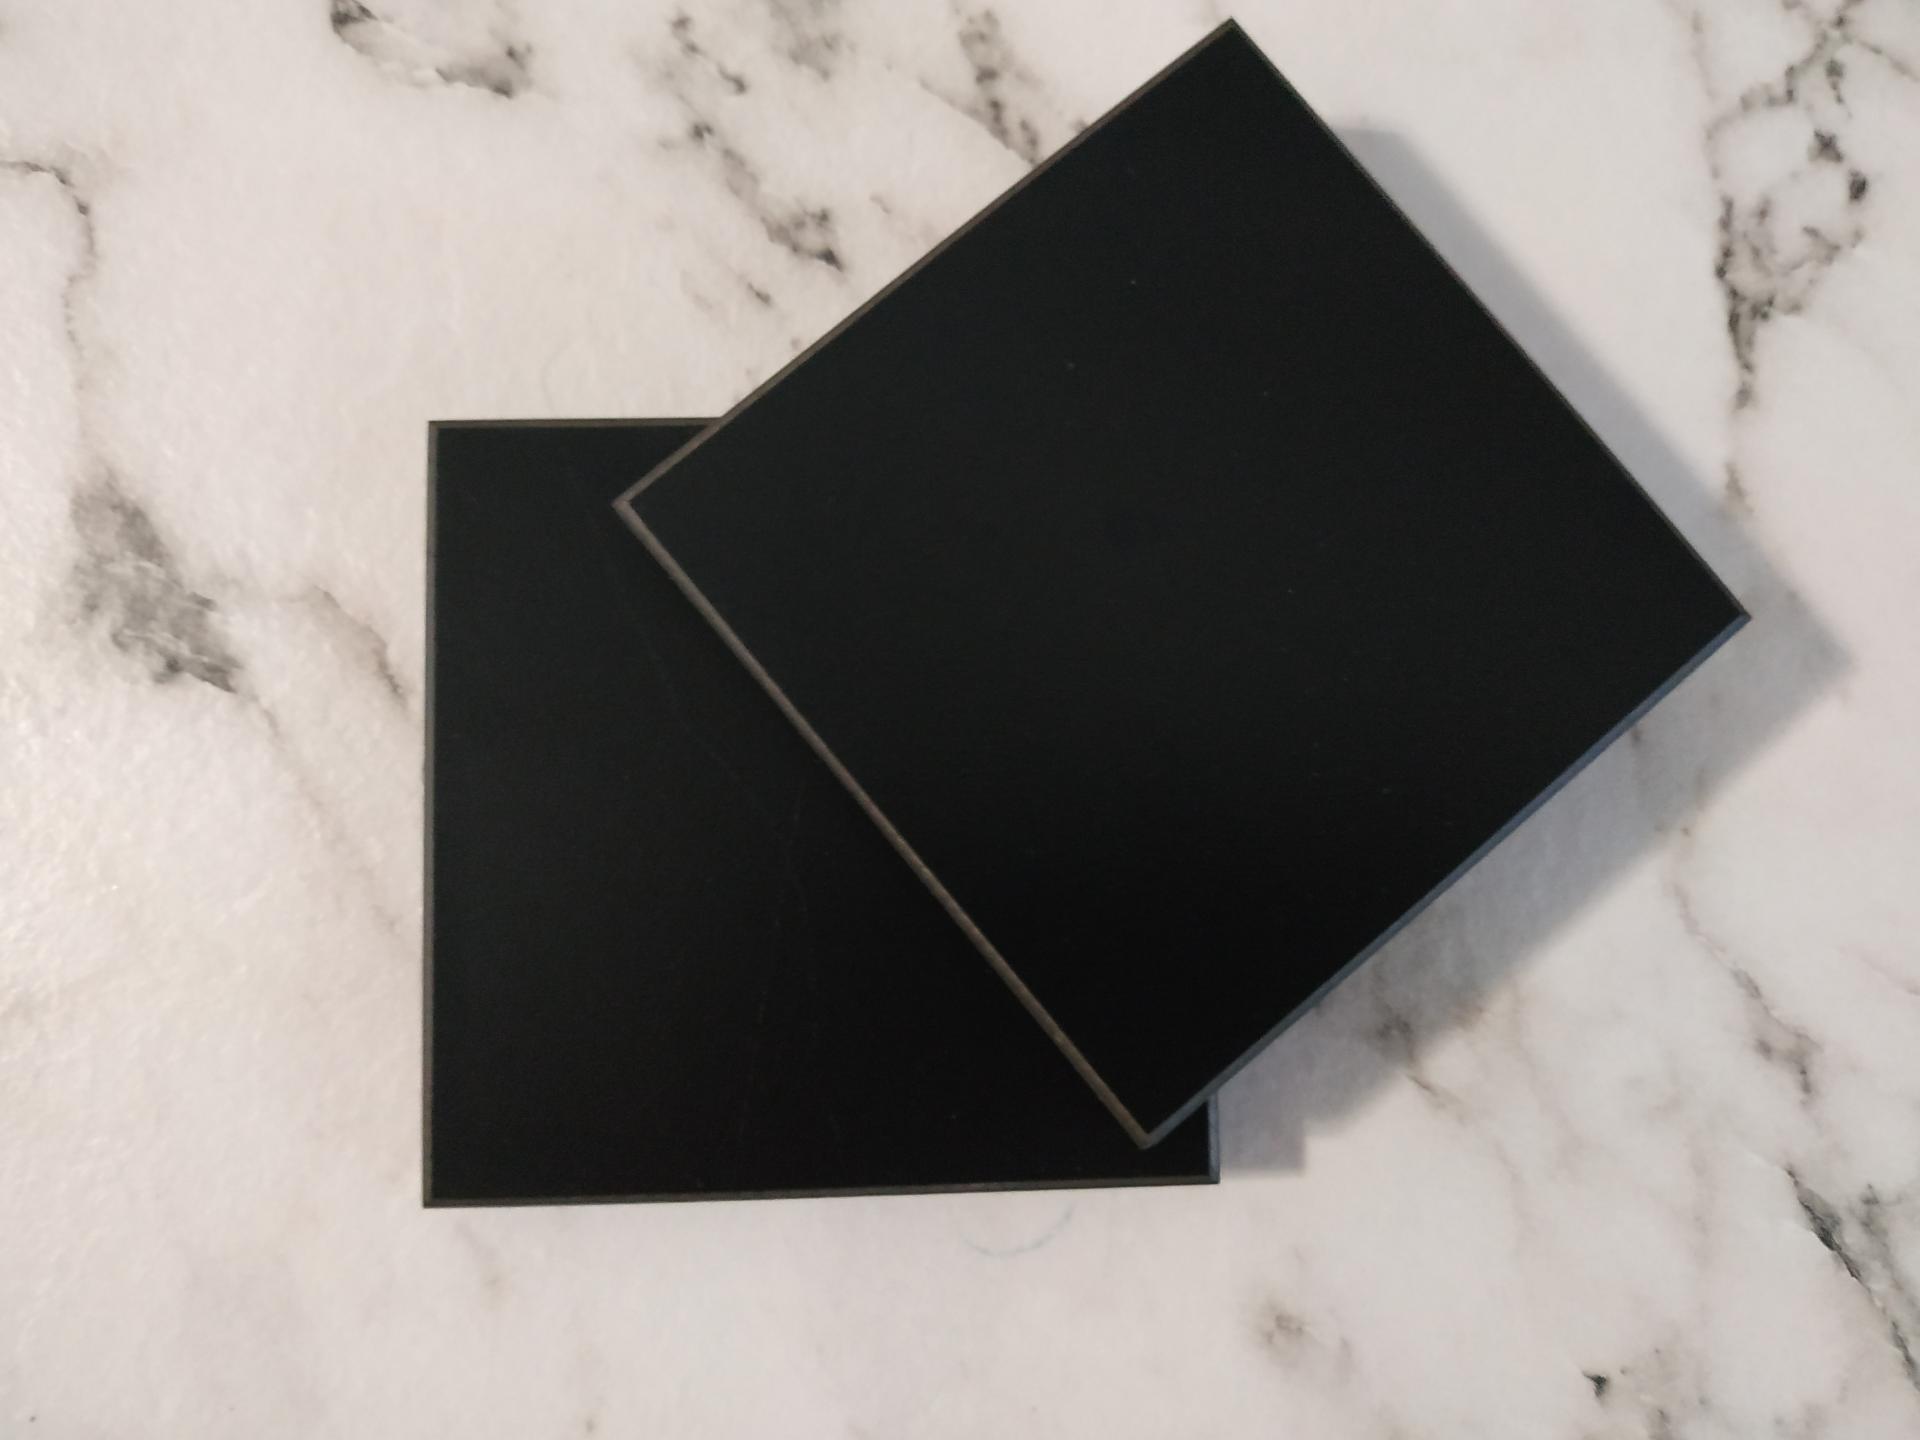 Tablero compacto negro